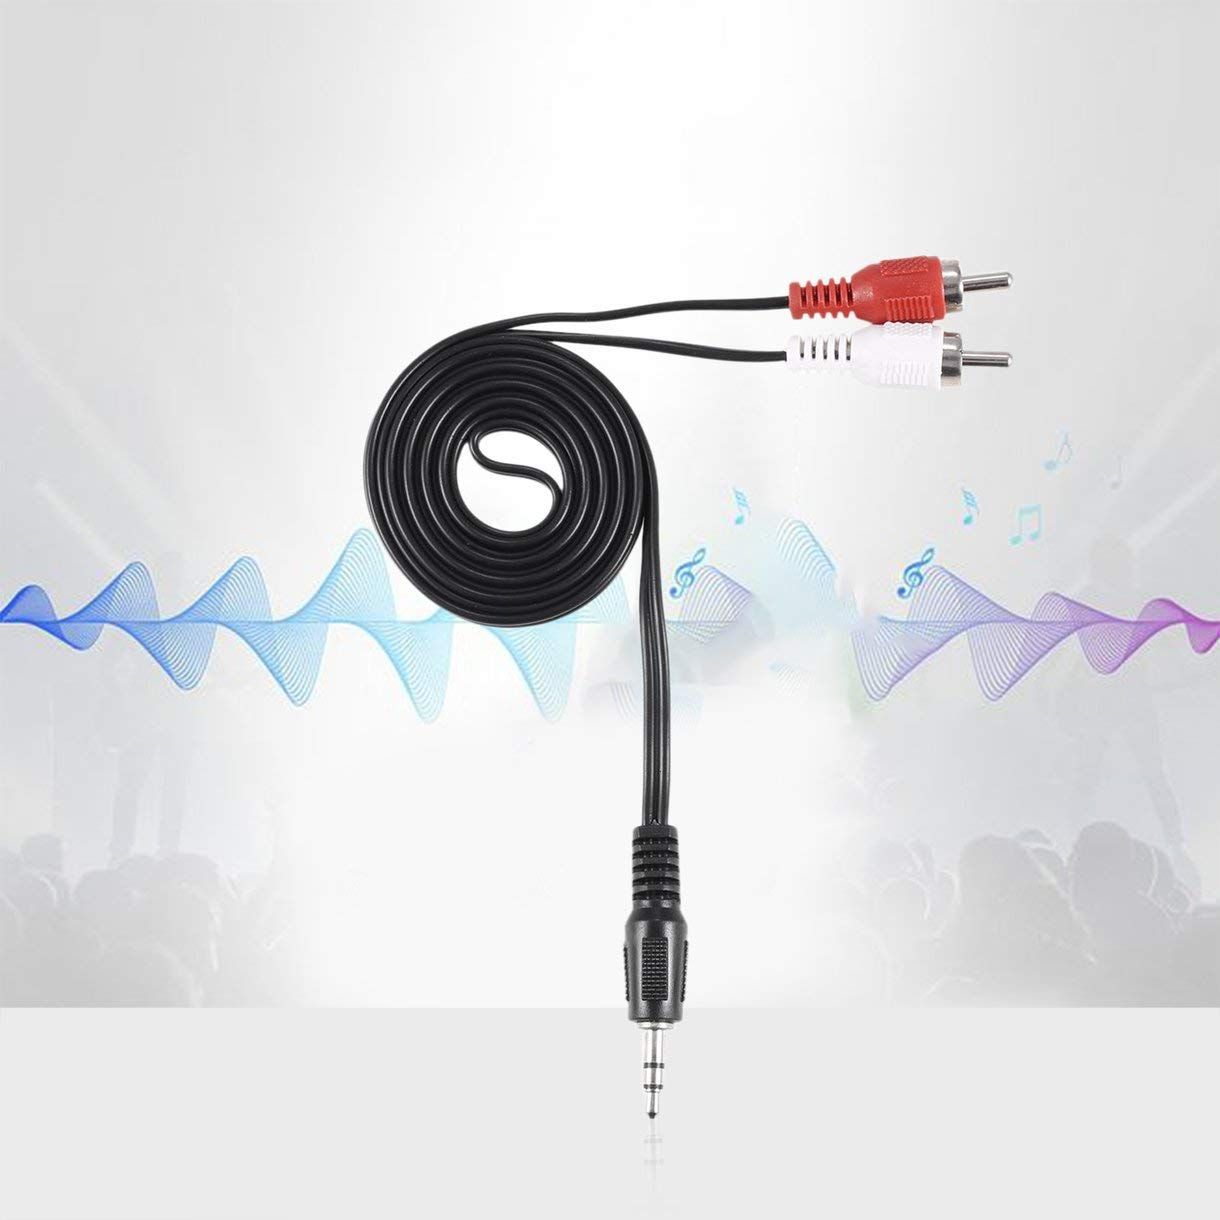 1//8 Inch 3.5mm Plug Jack to 2 RCA Male Stereo Audio Earphone Headphone Headset Y Splitter Adaptor Cable